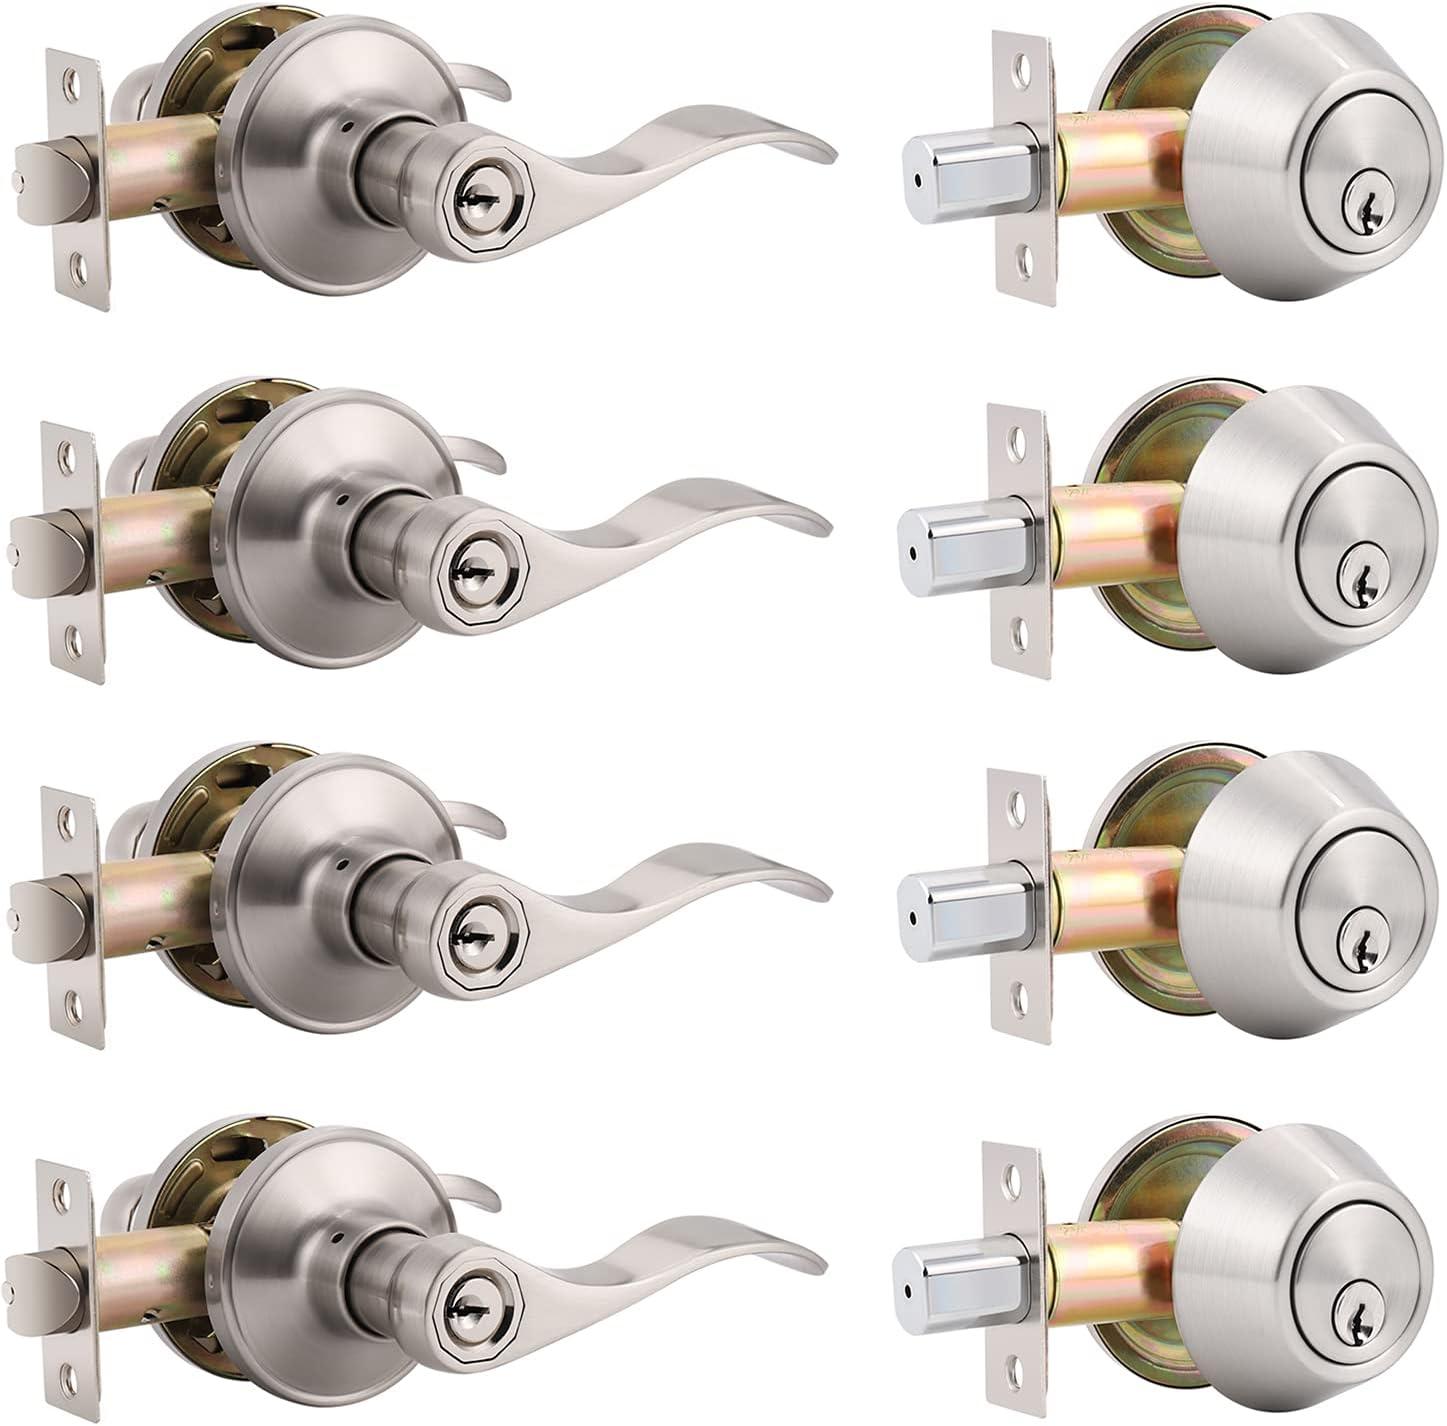 4 Pack Keyed Alike Front Door Entry Lever Lockset and Single Cylinder Deadbolt Combination Set, Wave Style Door Handle Set for Front Door or Office, Reversible for Right or Left Handed, Satin Nickel